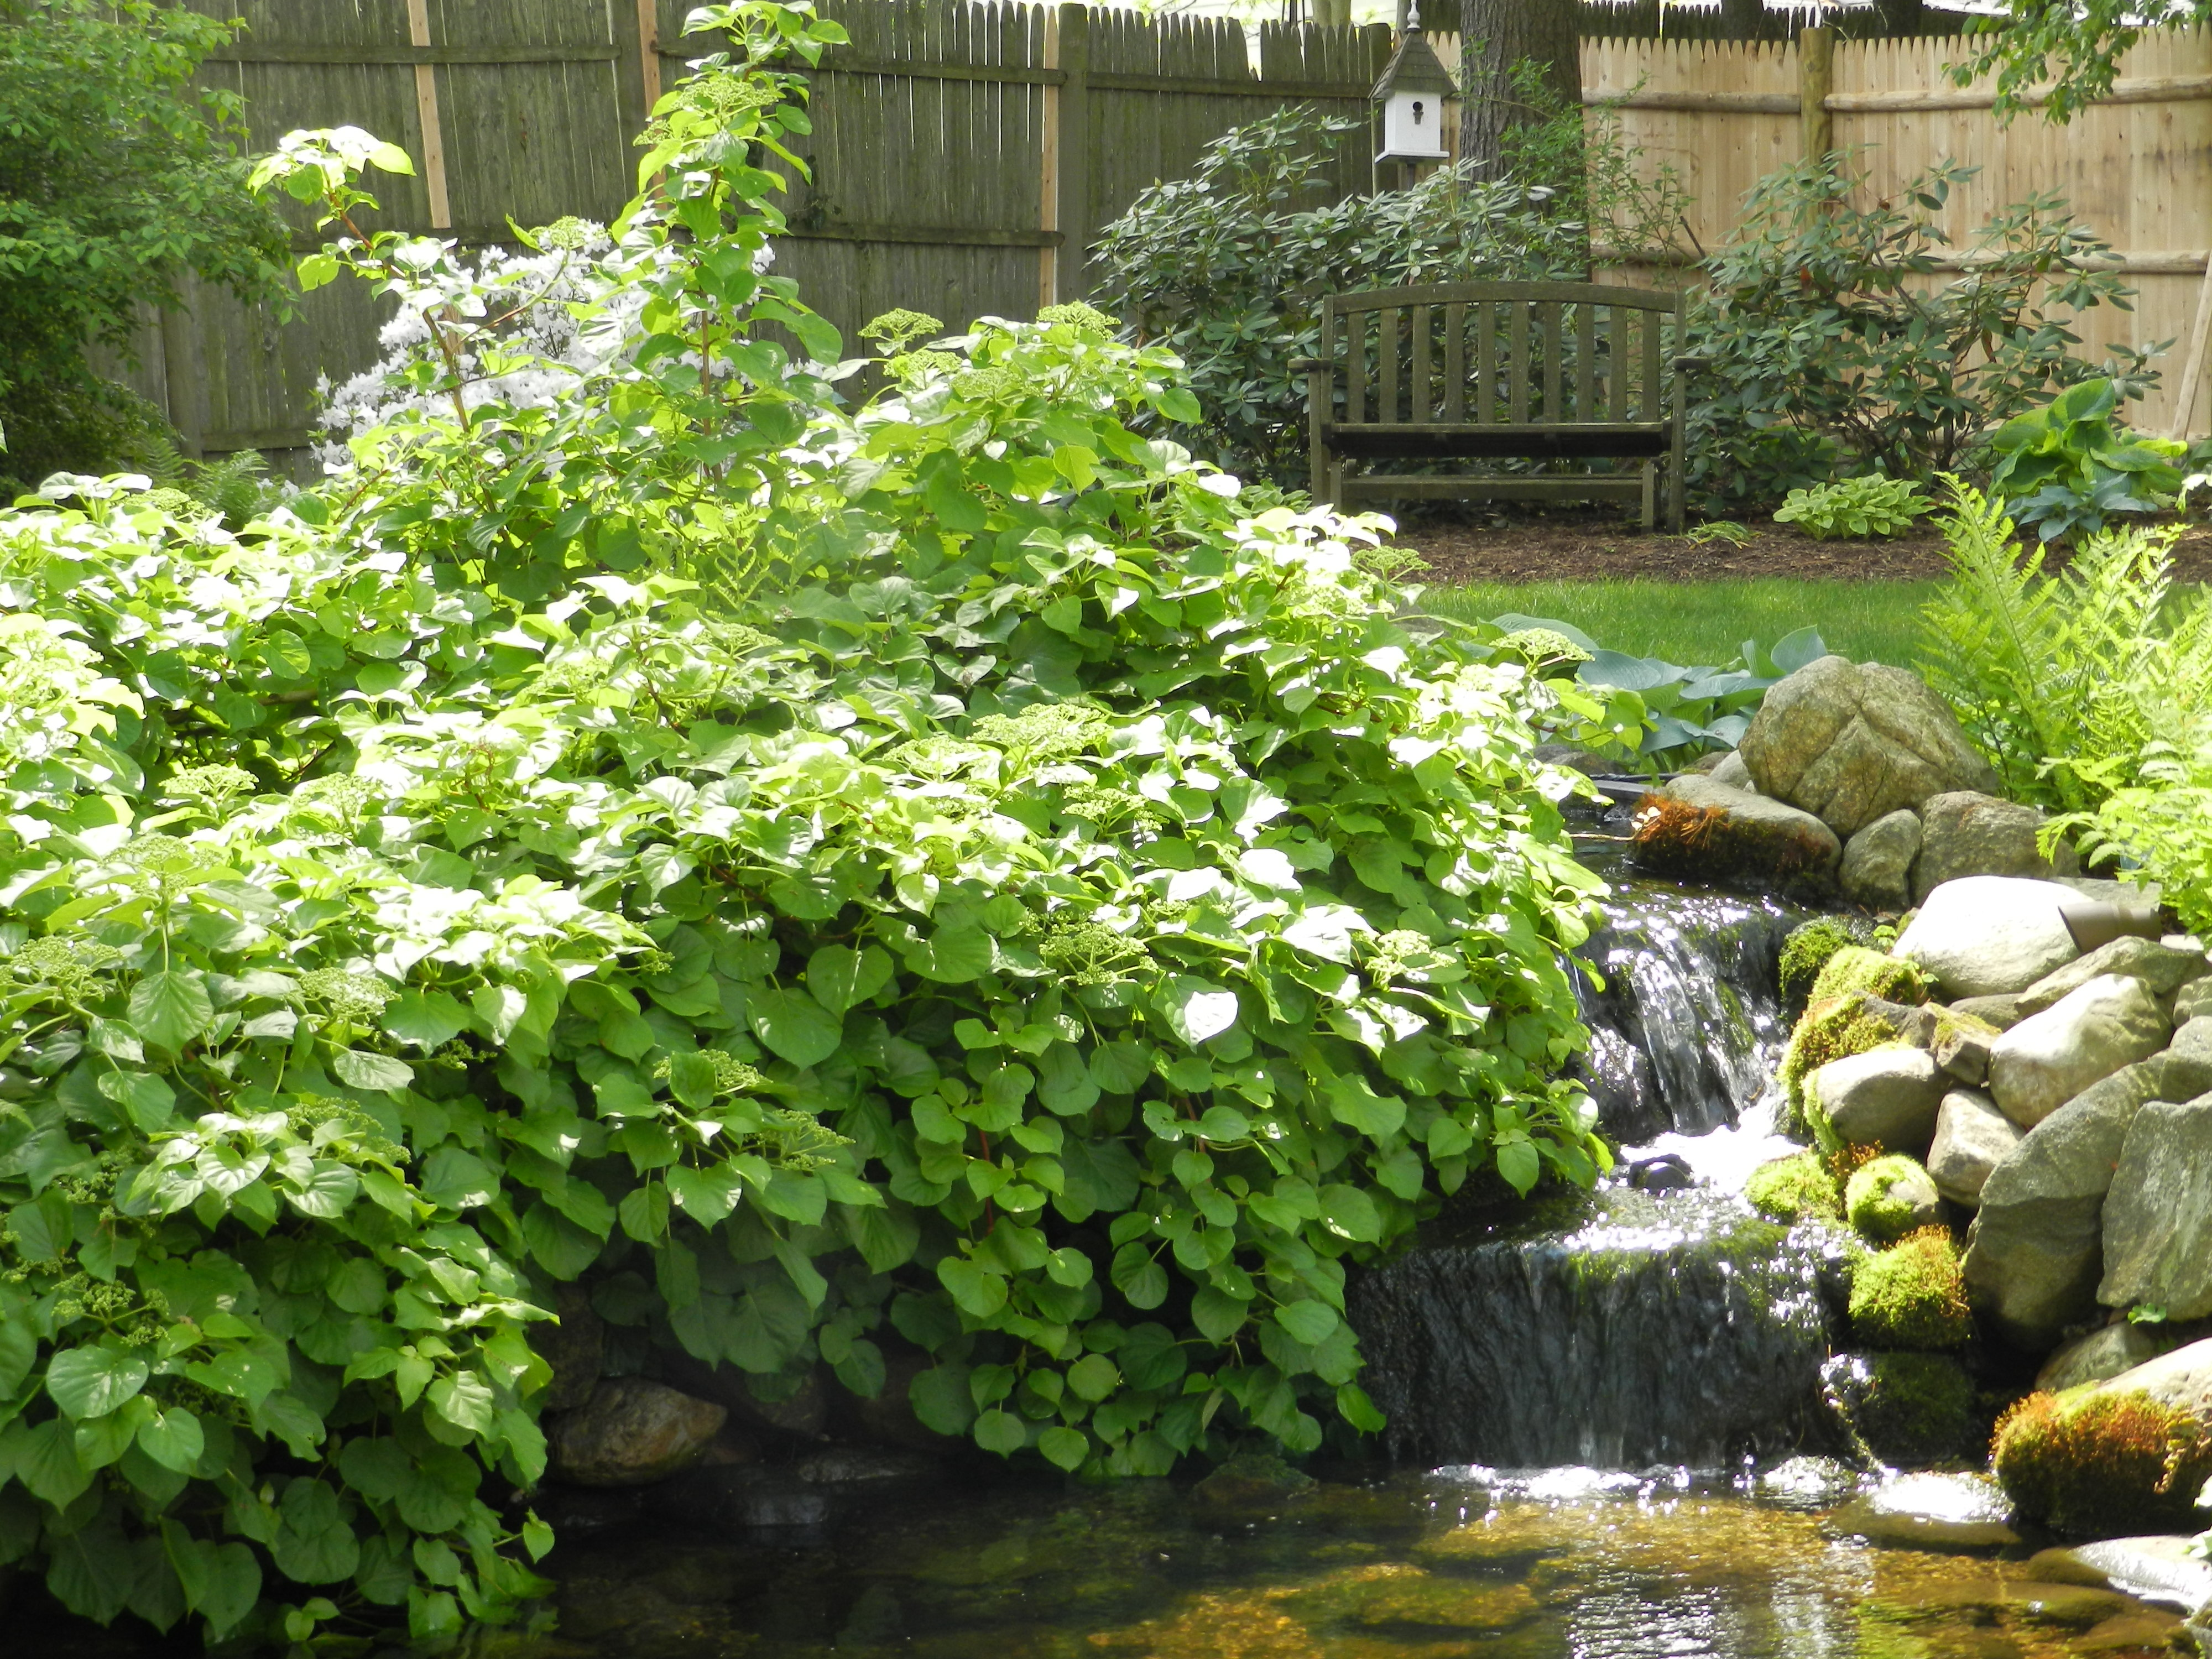 Member's garden